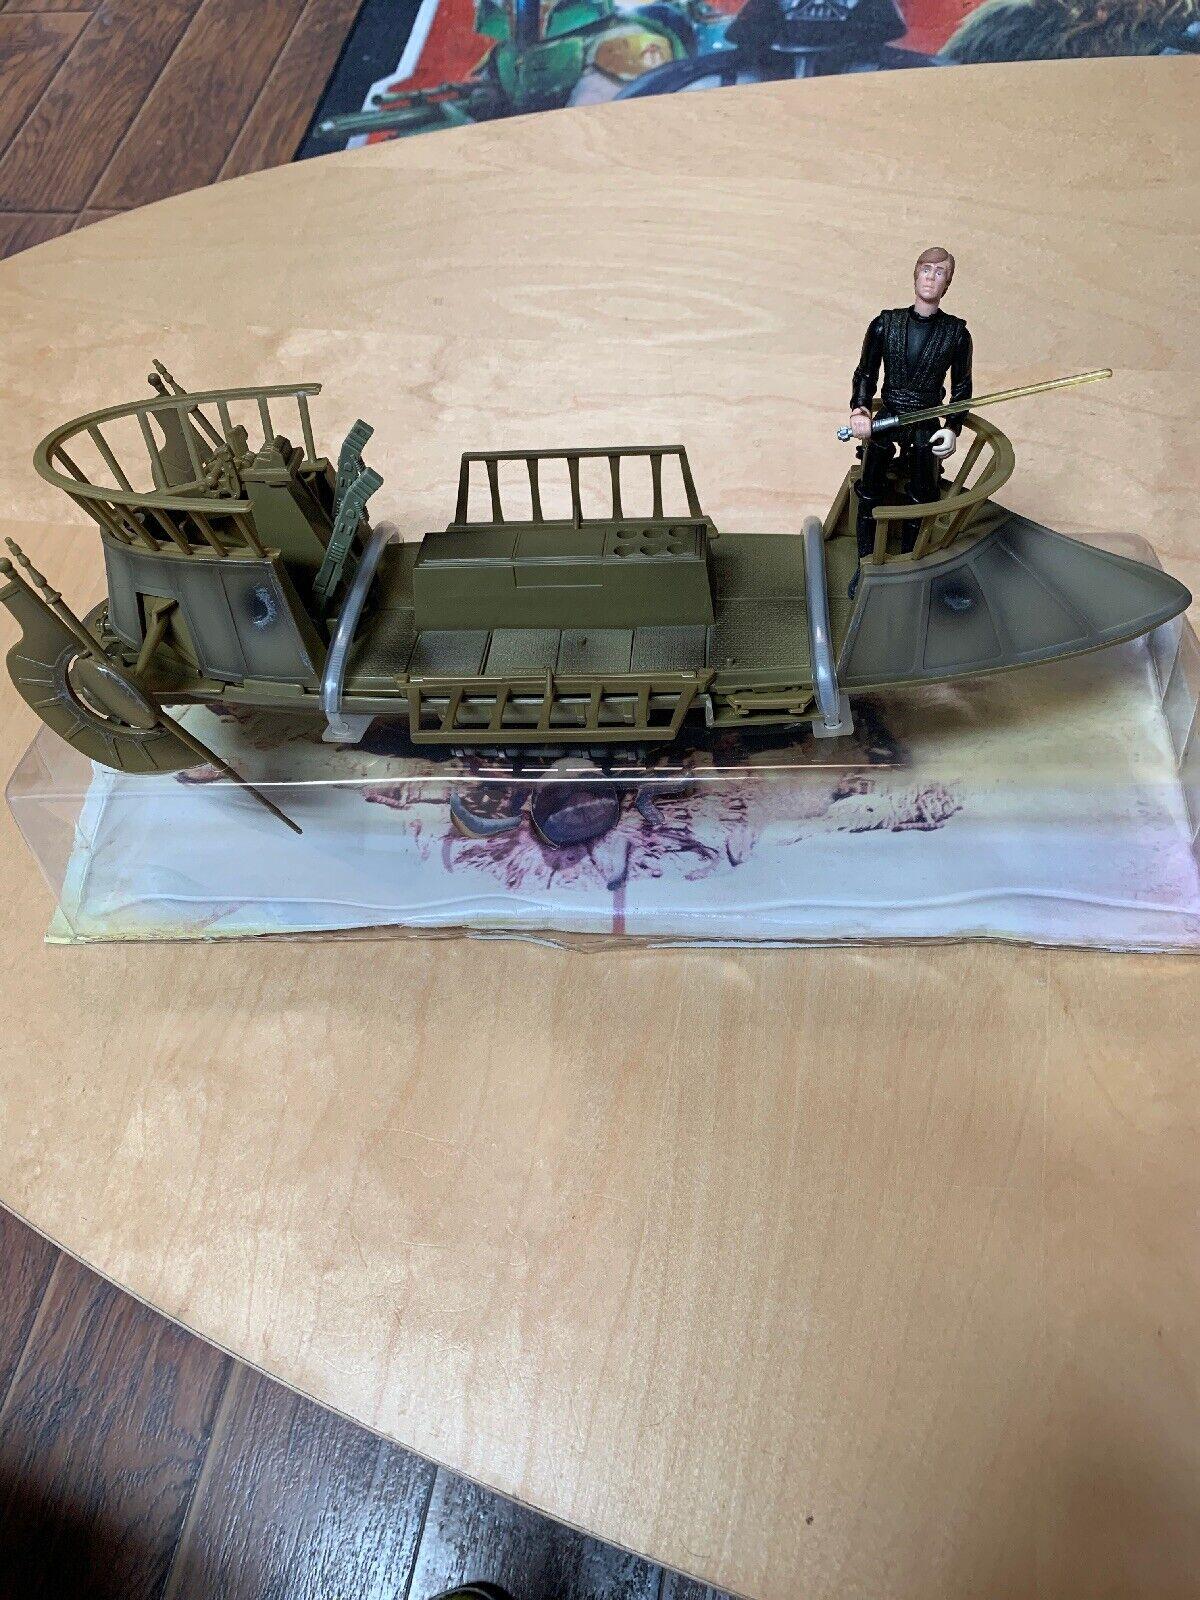 Star Wars Legacy Jabba's Sail Barge Khetanna Tatooine Skiff Sarlacc Diorama